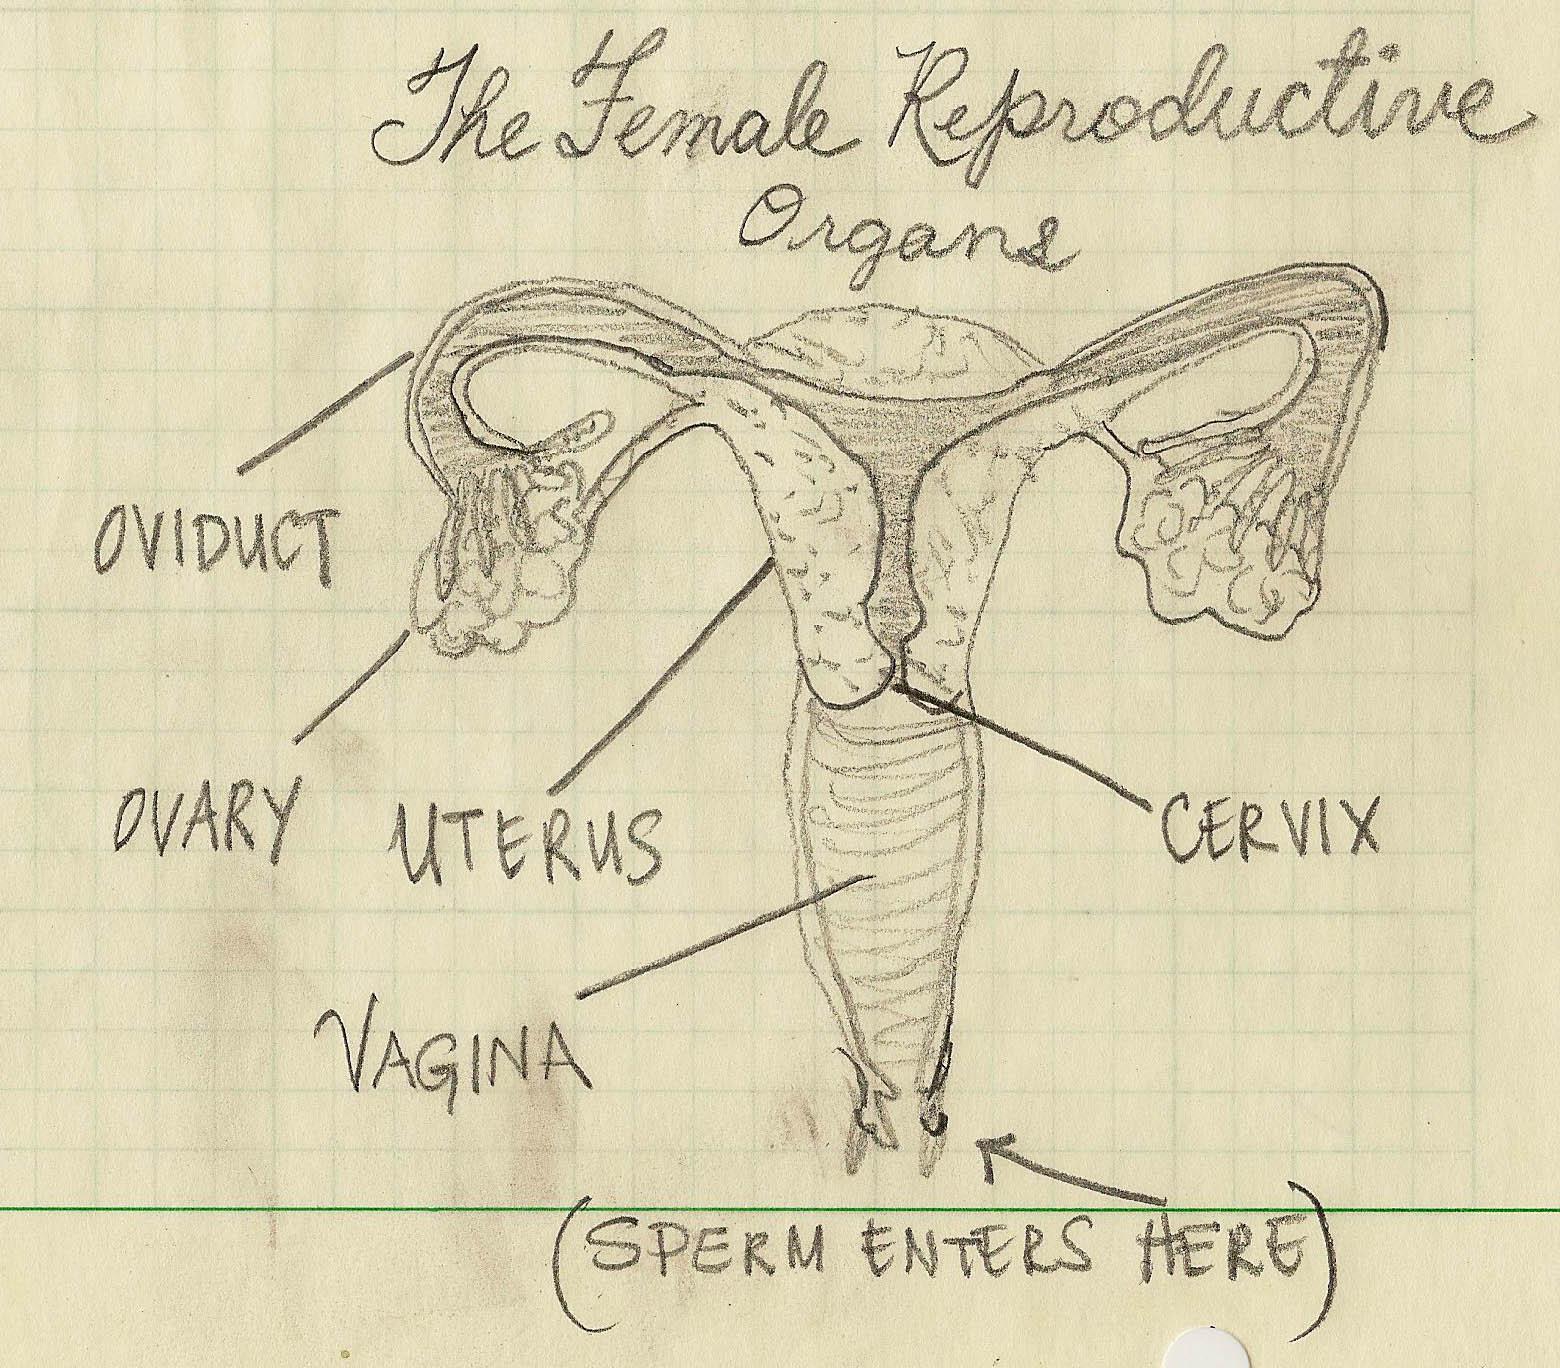 http://1.bp.blogspot.com/-7irB36UDtvs/Tvyjr1fk14I/AAAAAAAABEA/T1WBYwGM-KM/s1600/Female%2Breproductive%2Borgans%2Bcopy_1.jpg